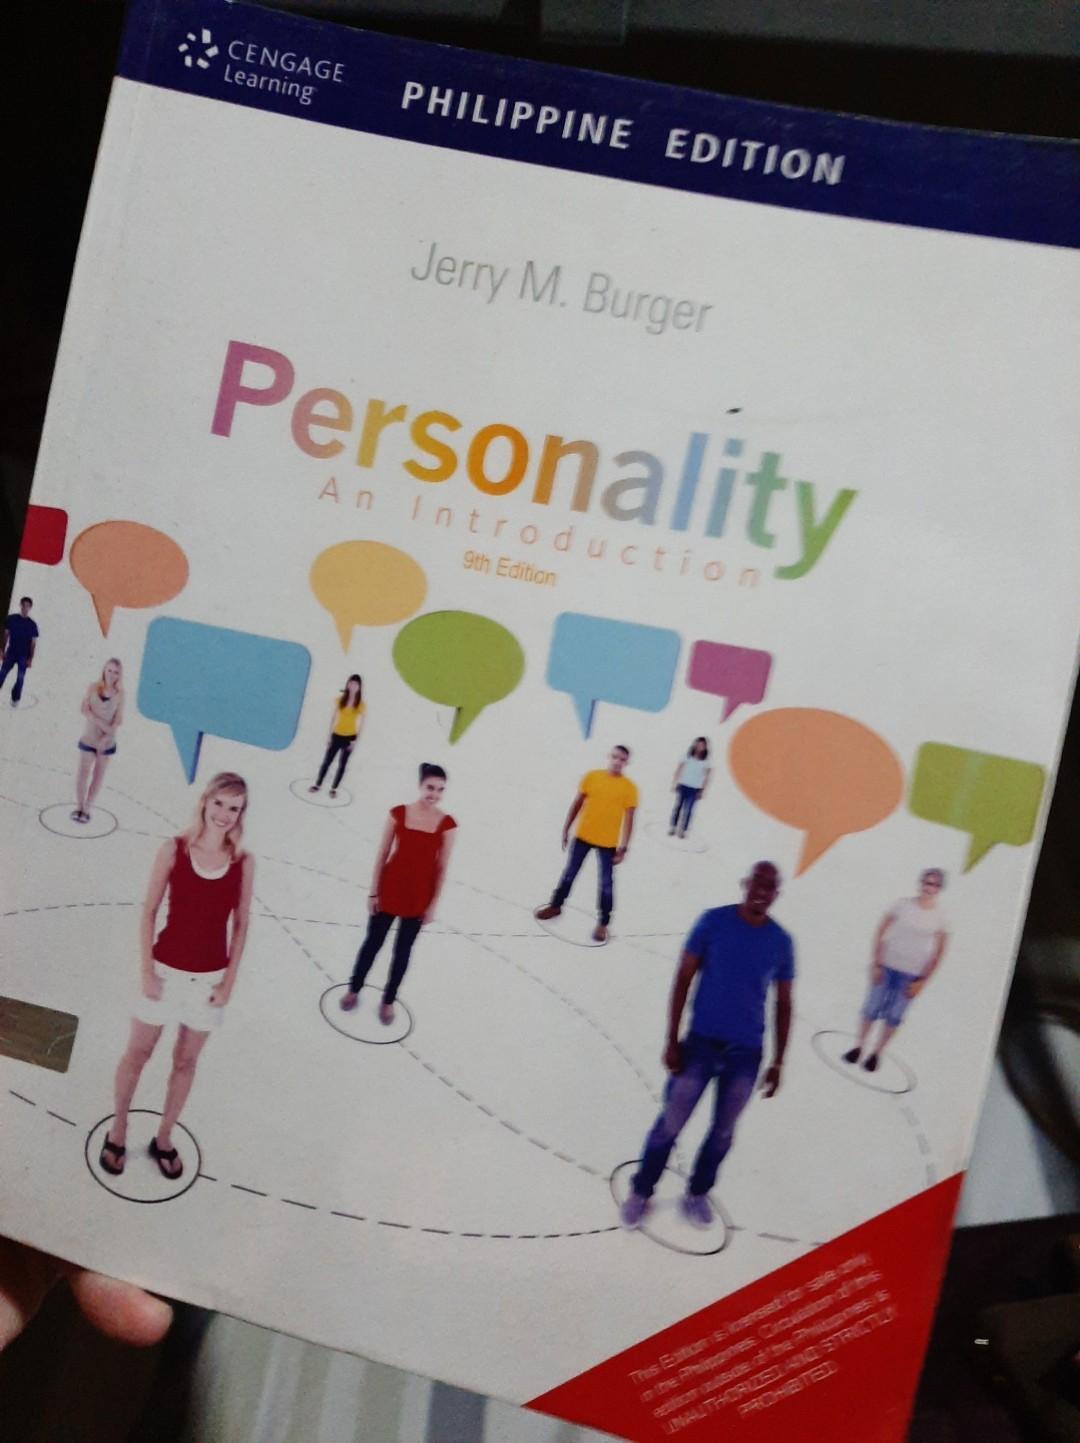 Jeremy Burger Personality: An Introdution (9th Ed.) Psychology Books